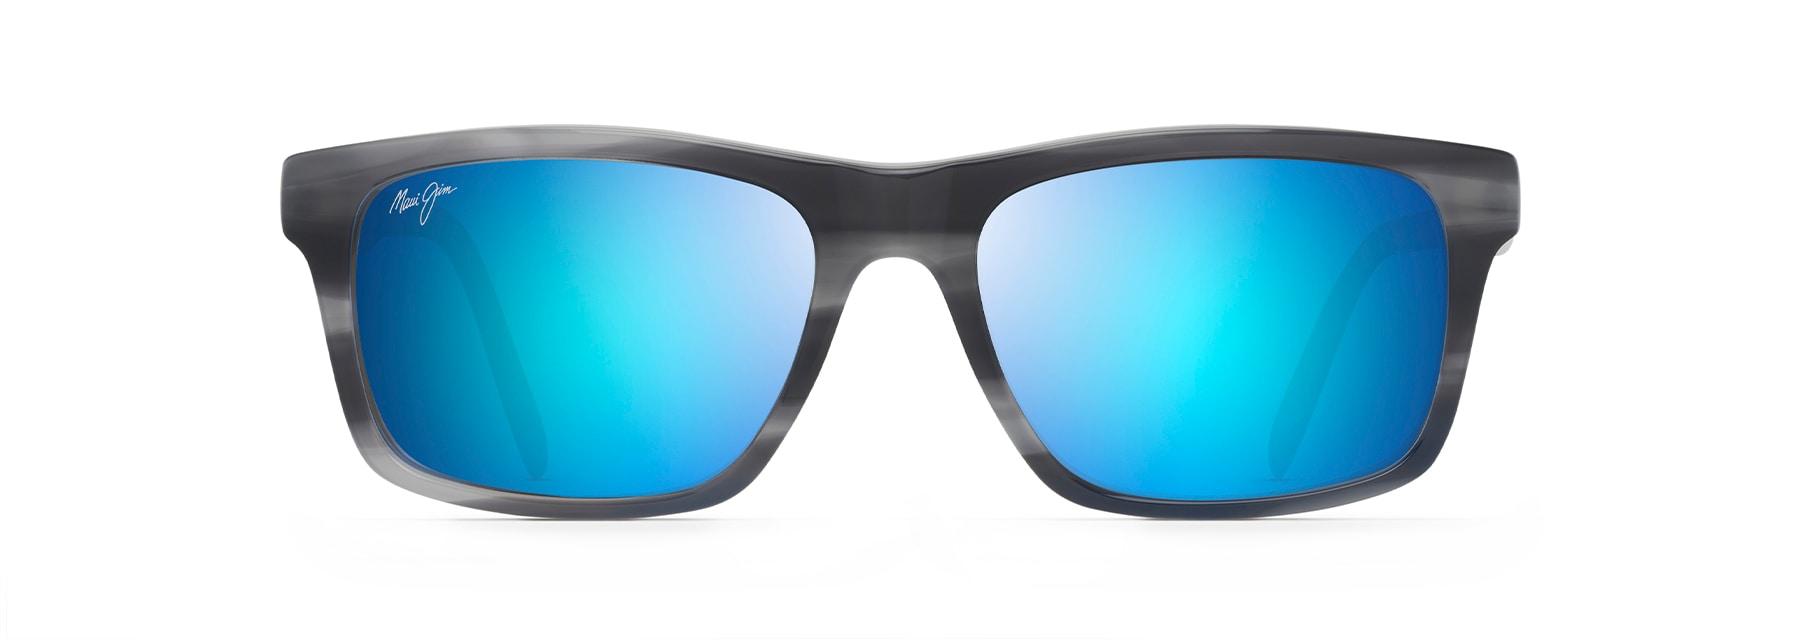 Maui Jim 439-2M Maui Jim Pokowai Rectangular Frame Sunglasses with with Patented PolarizedPlus2 Lens Technology Maui Jim Sunglasses